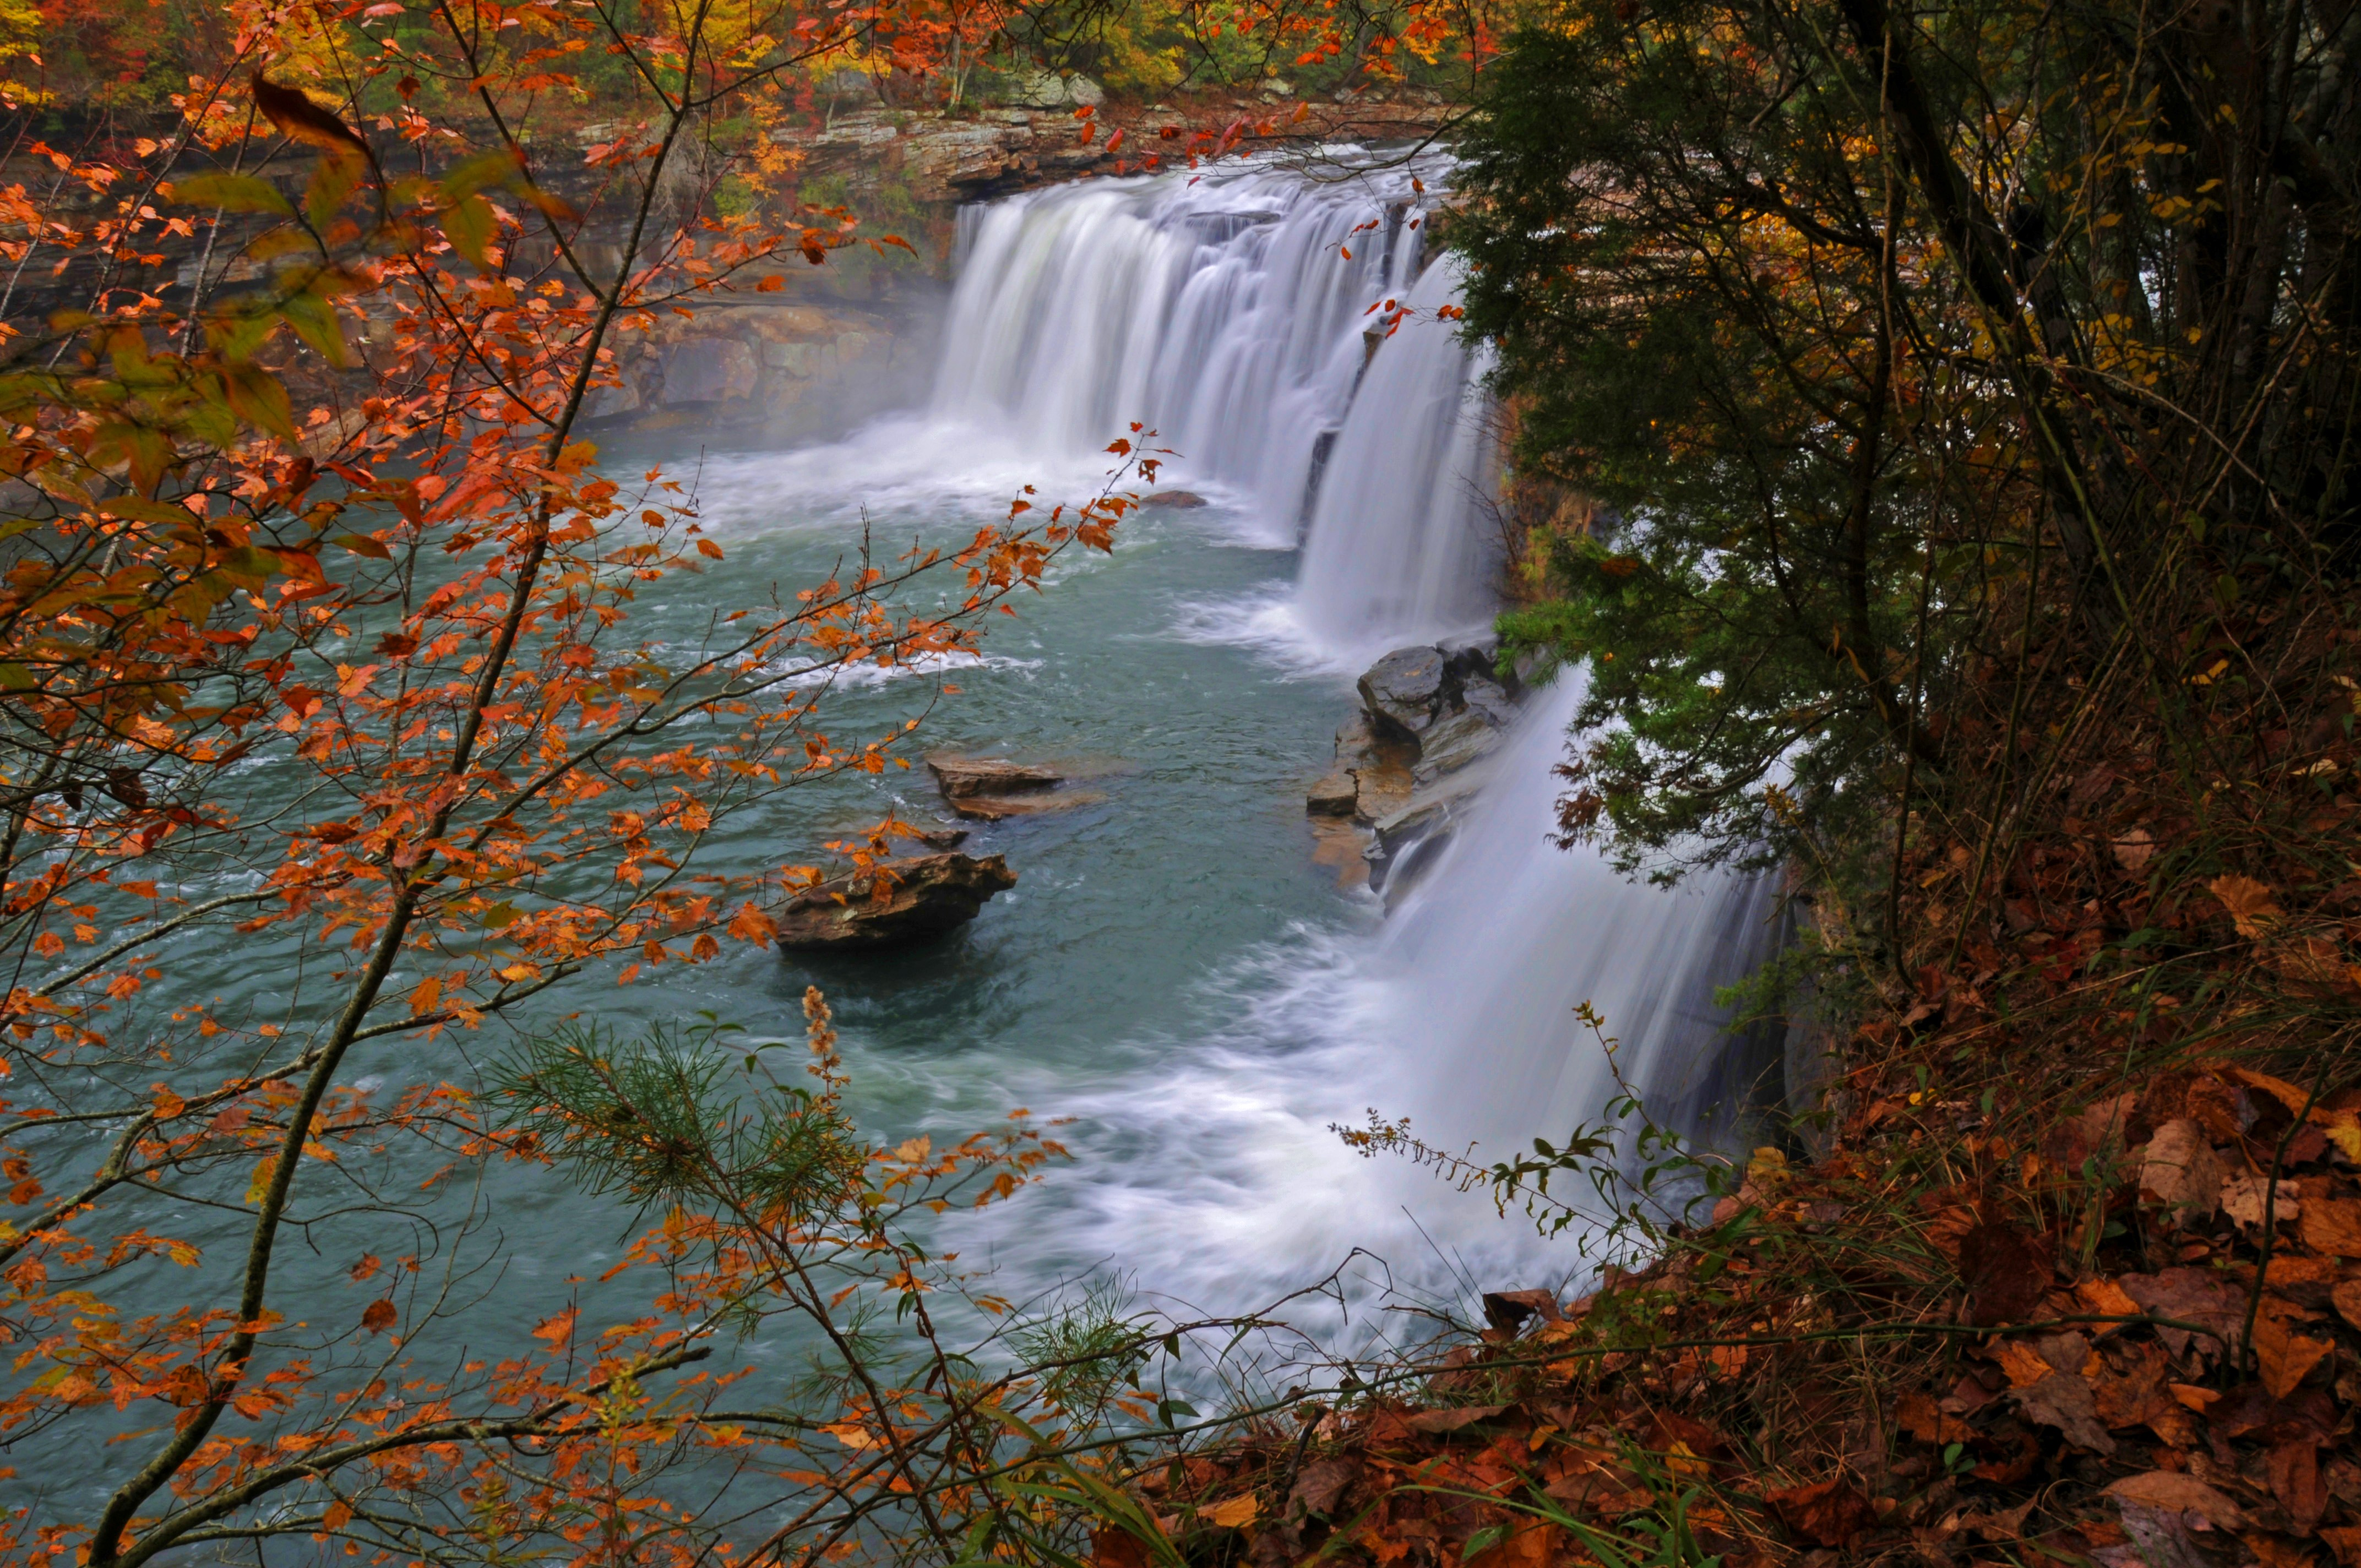 The Waterfalls of North Alabama | Visit North Alabama